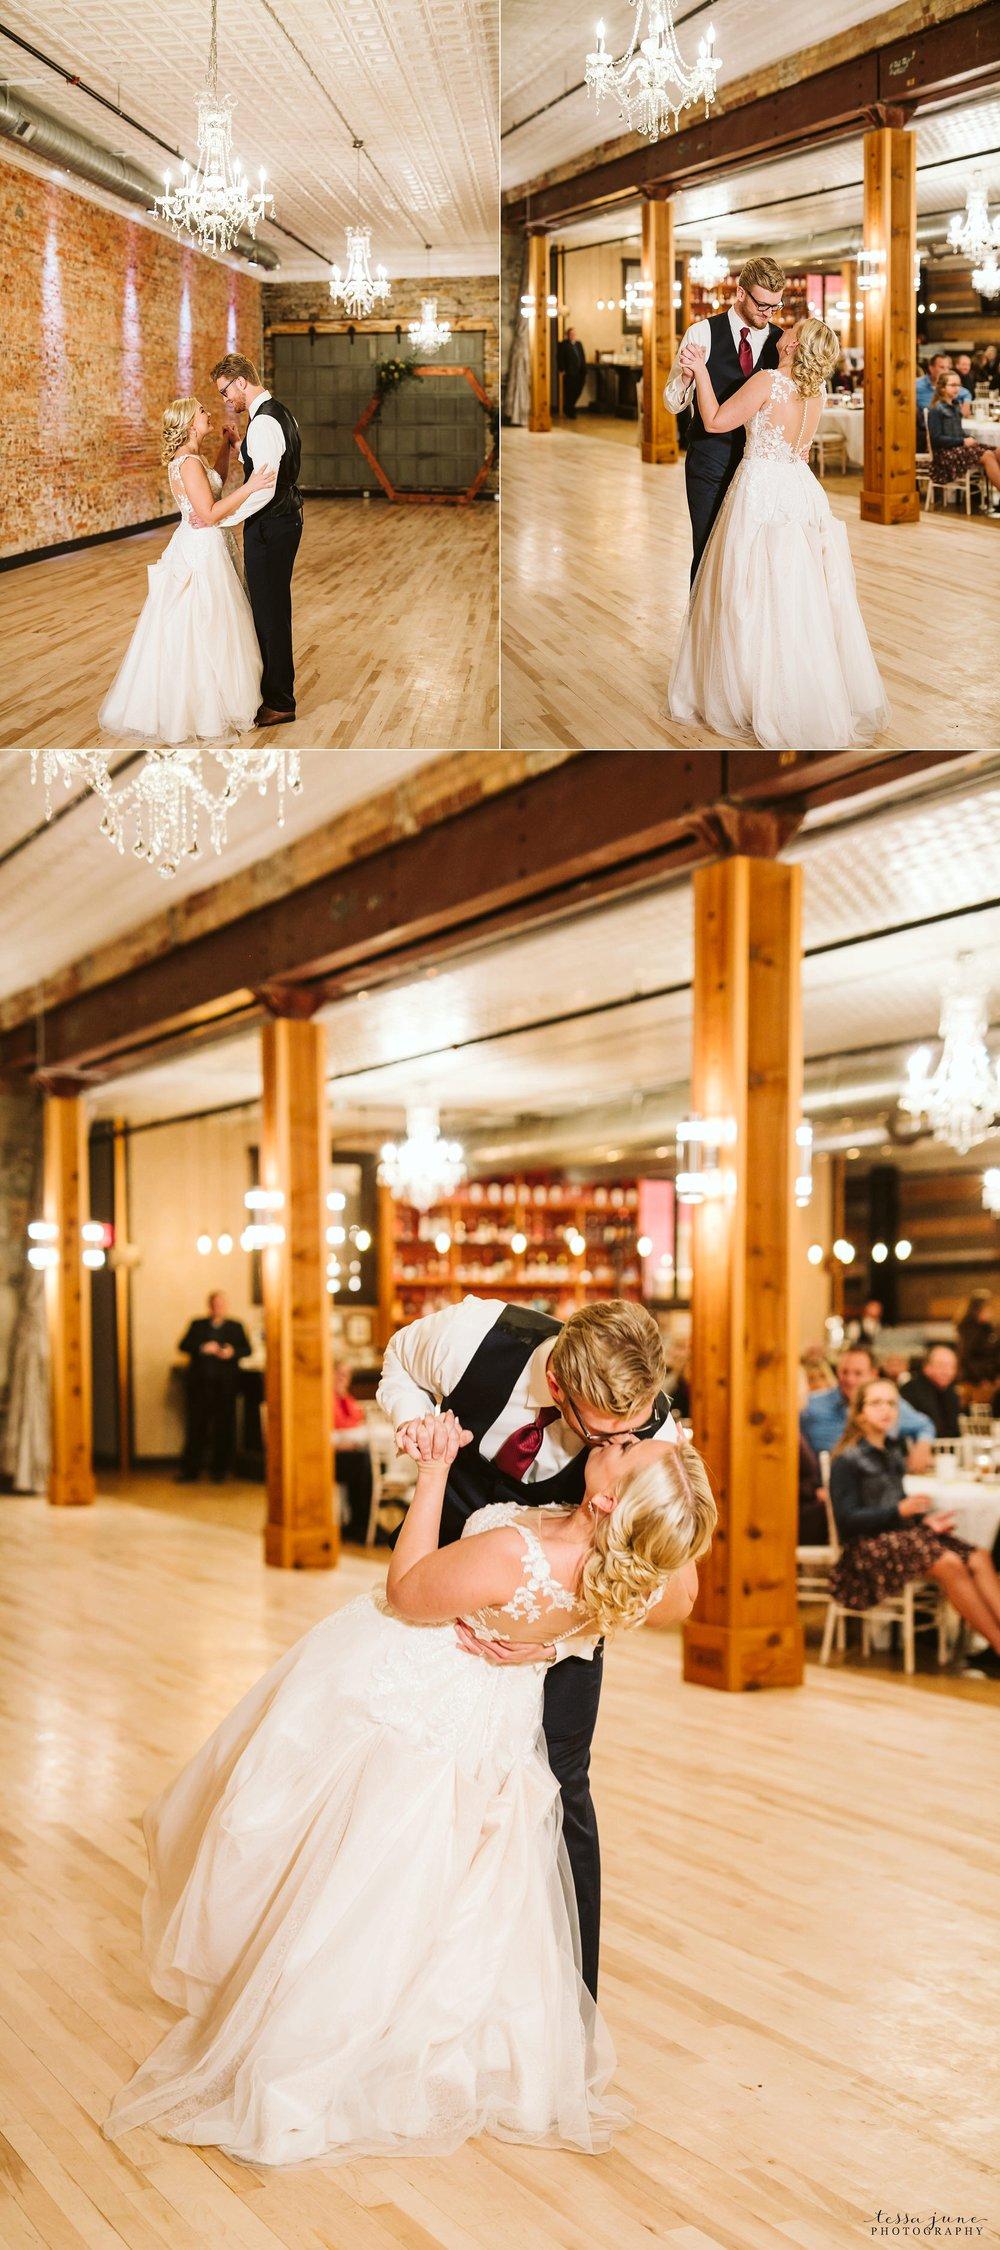 the-3-ten-event-venue-november-elegant-cozy-wedding-faribault-minnesota-138.jpg